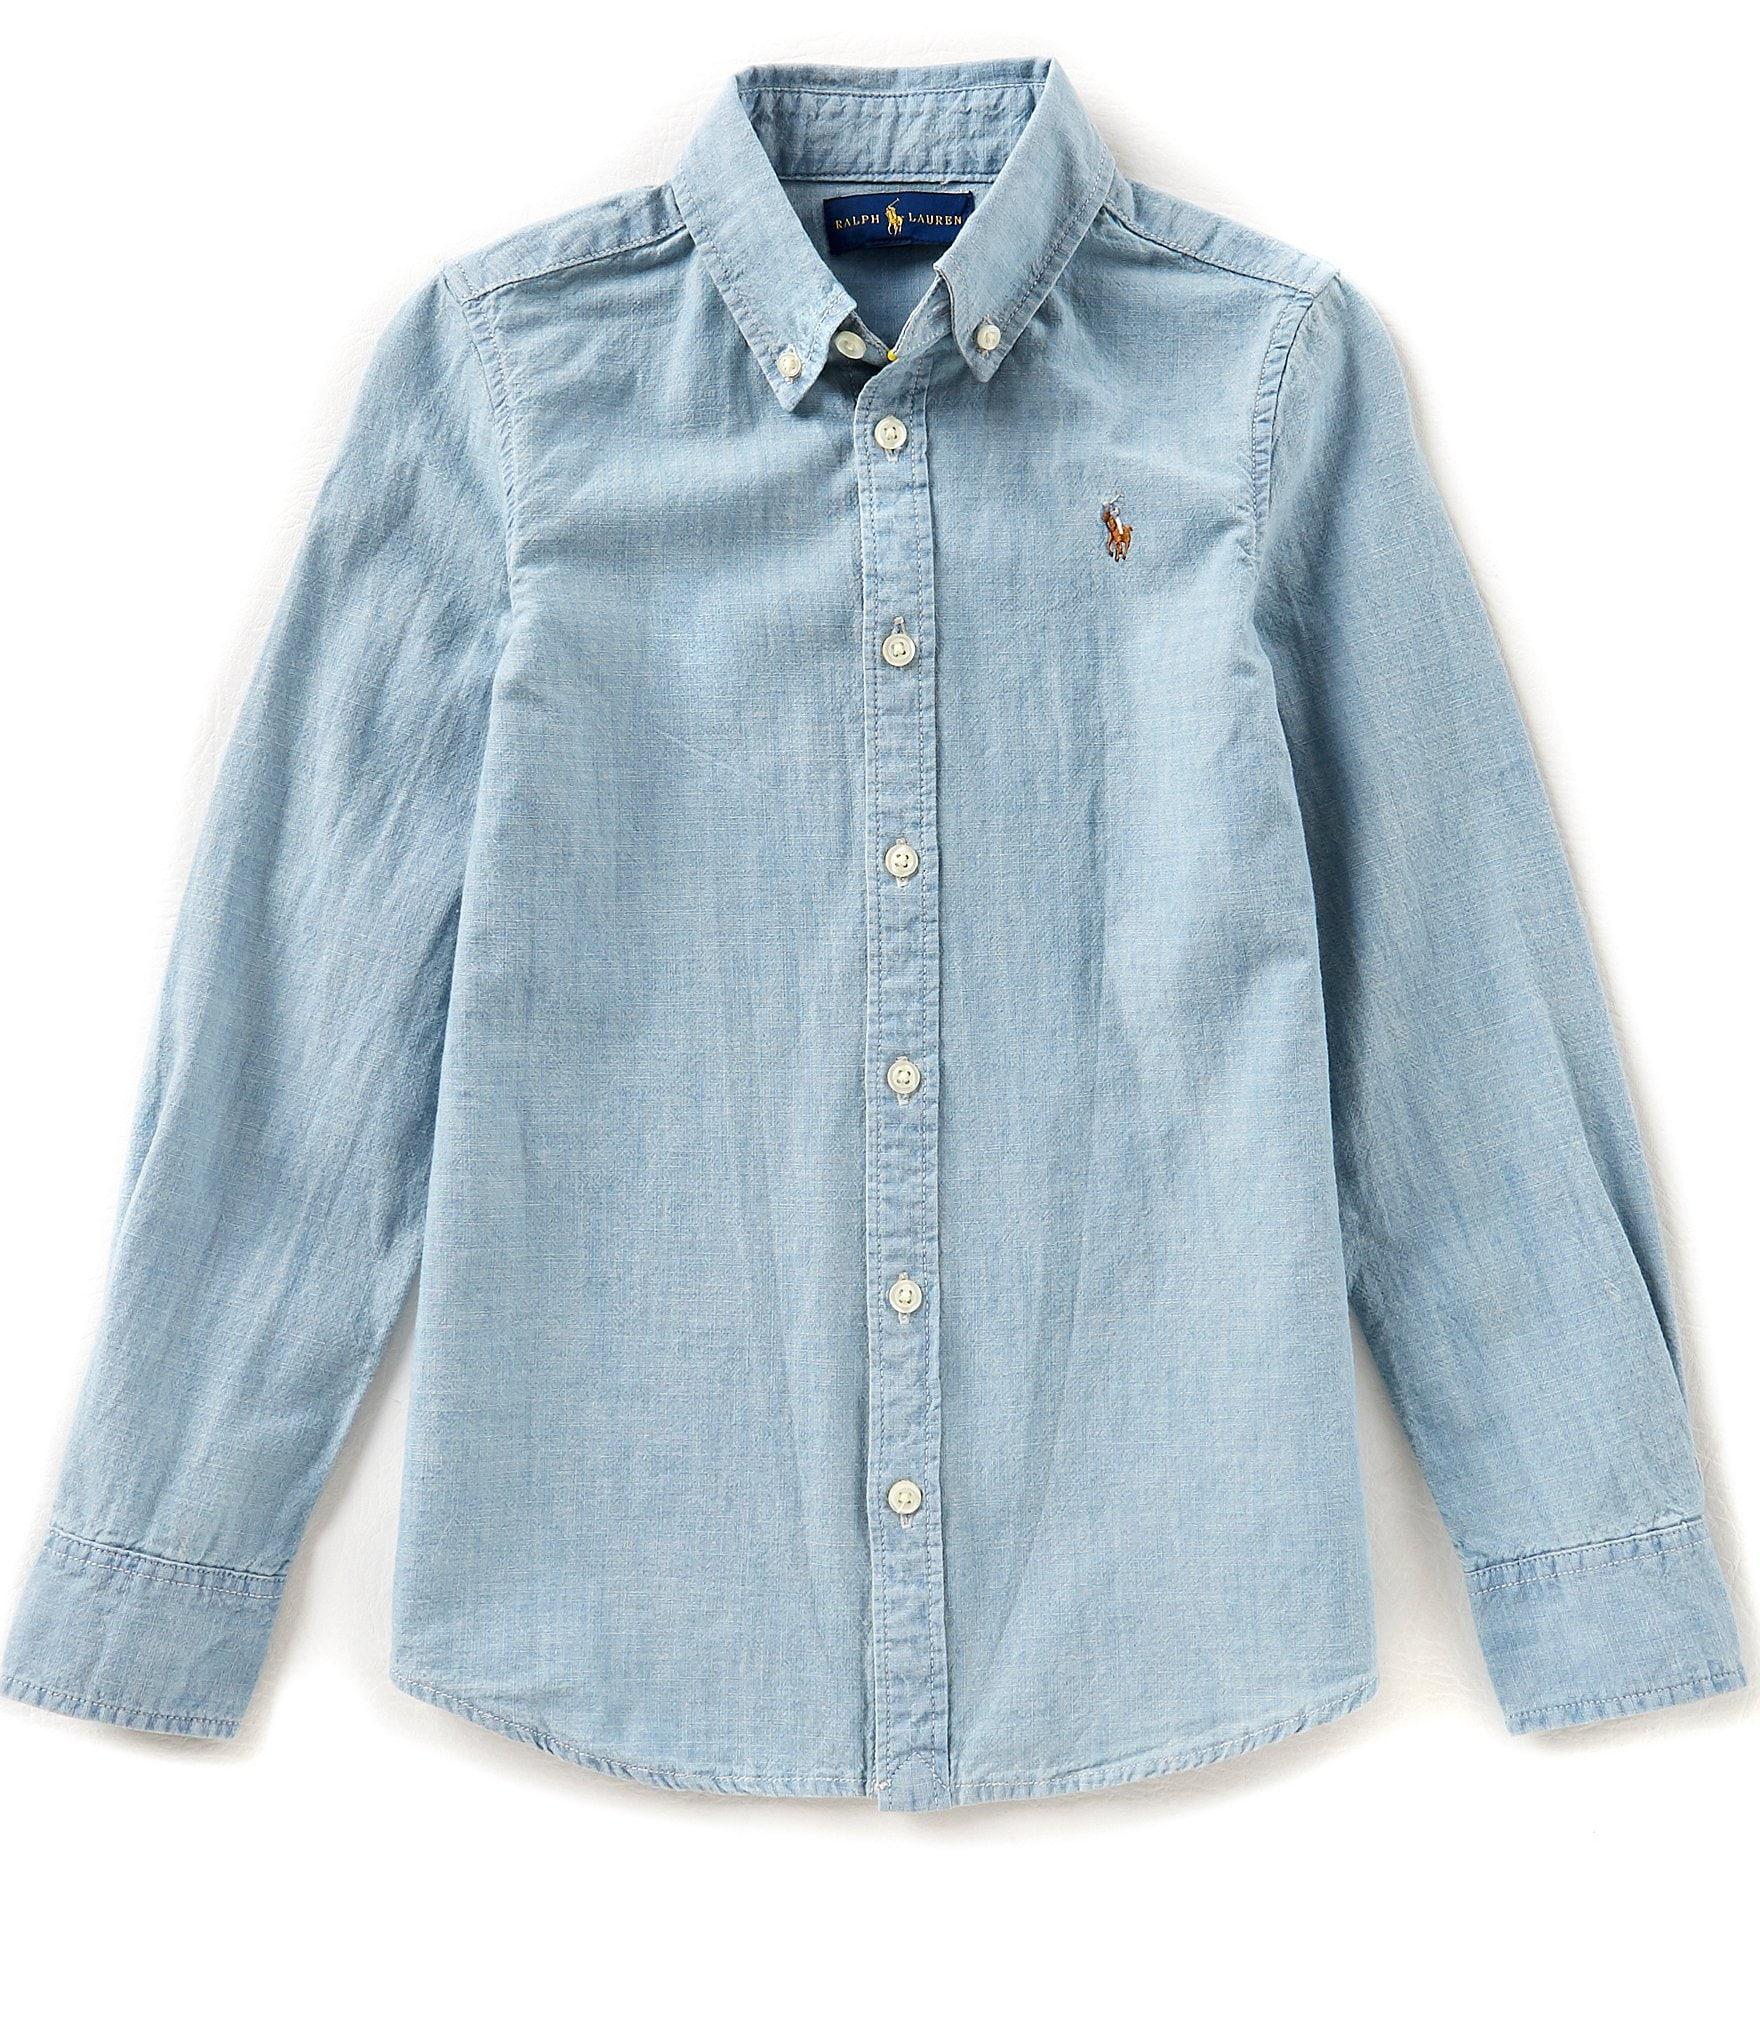 Ralph lauren childrenswear big girls 7 16 long sleeve for Chambray shirt for kids